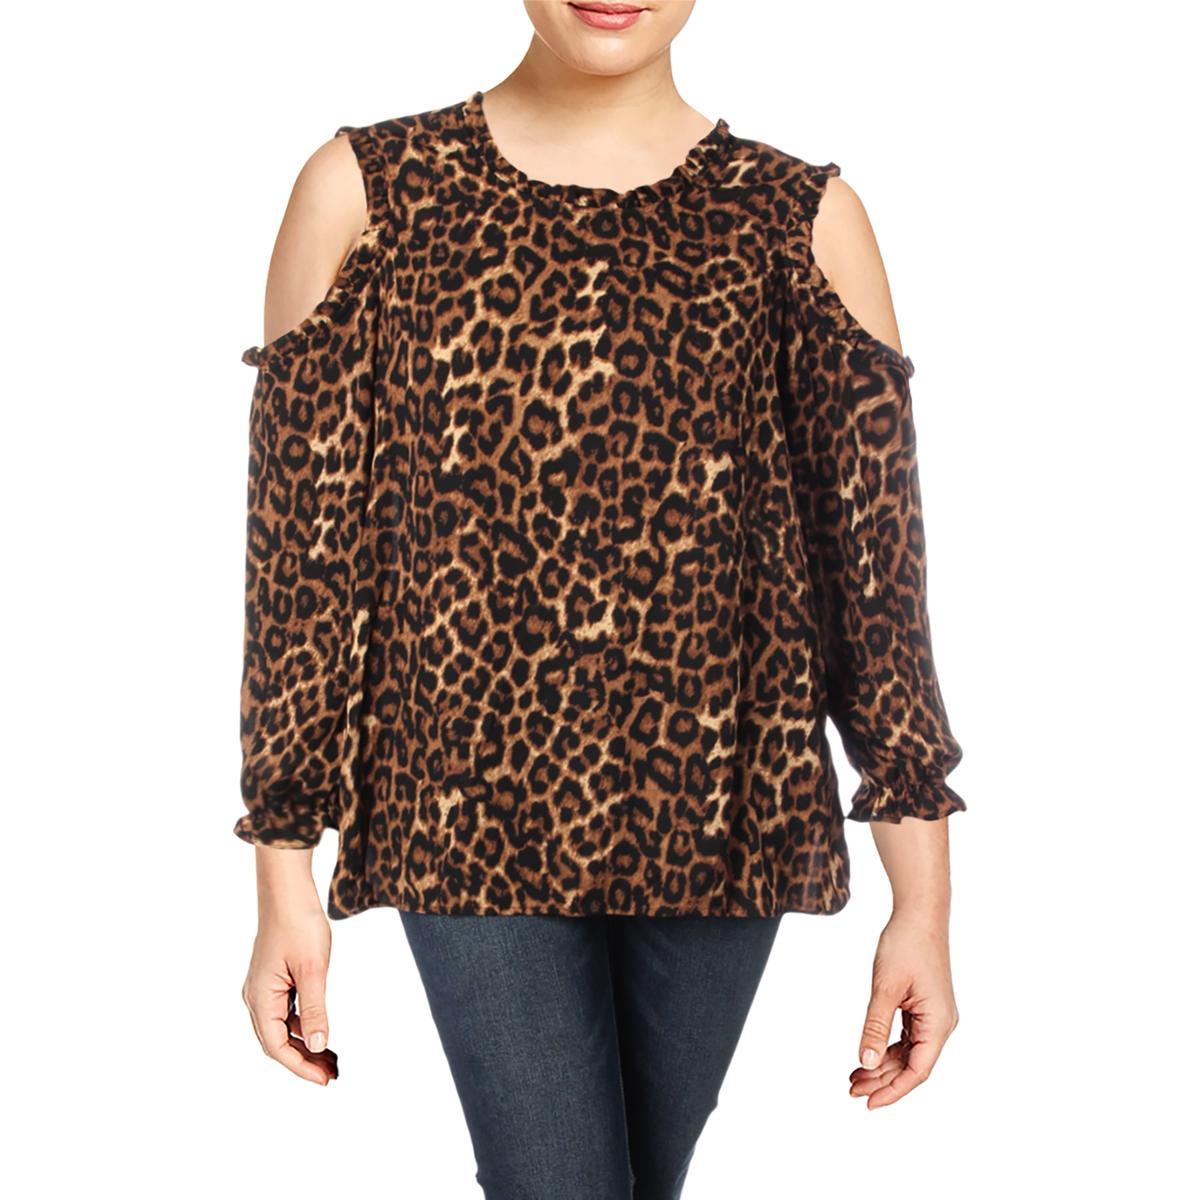 f1a3ea76bb0d93 Details about Cupio Womens Black Chiffon Animal Print Blouse Top Plus 1X  BHFO 3398